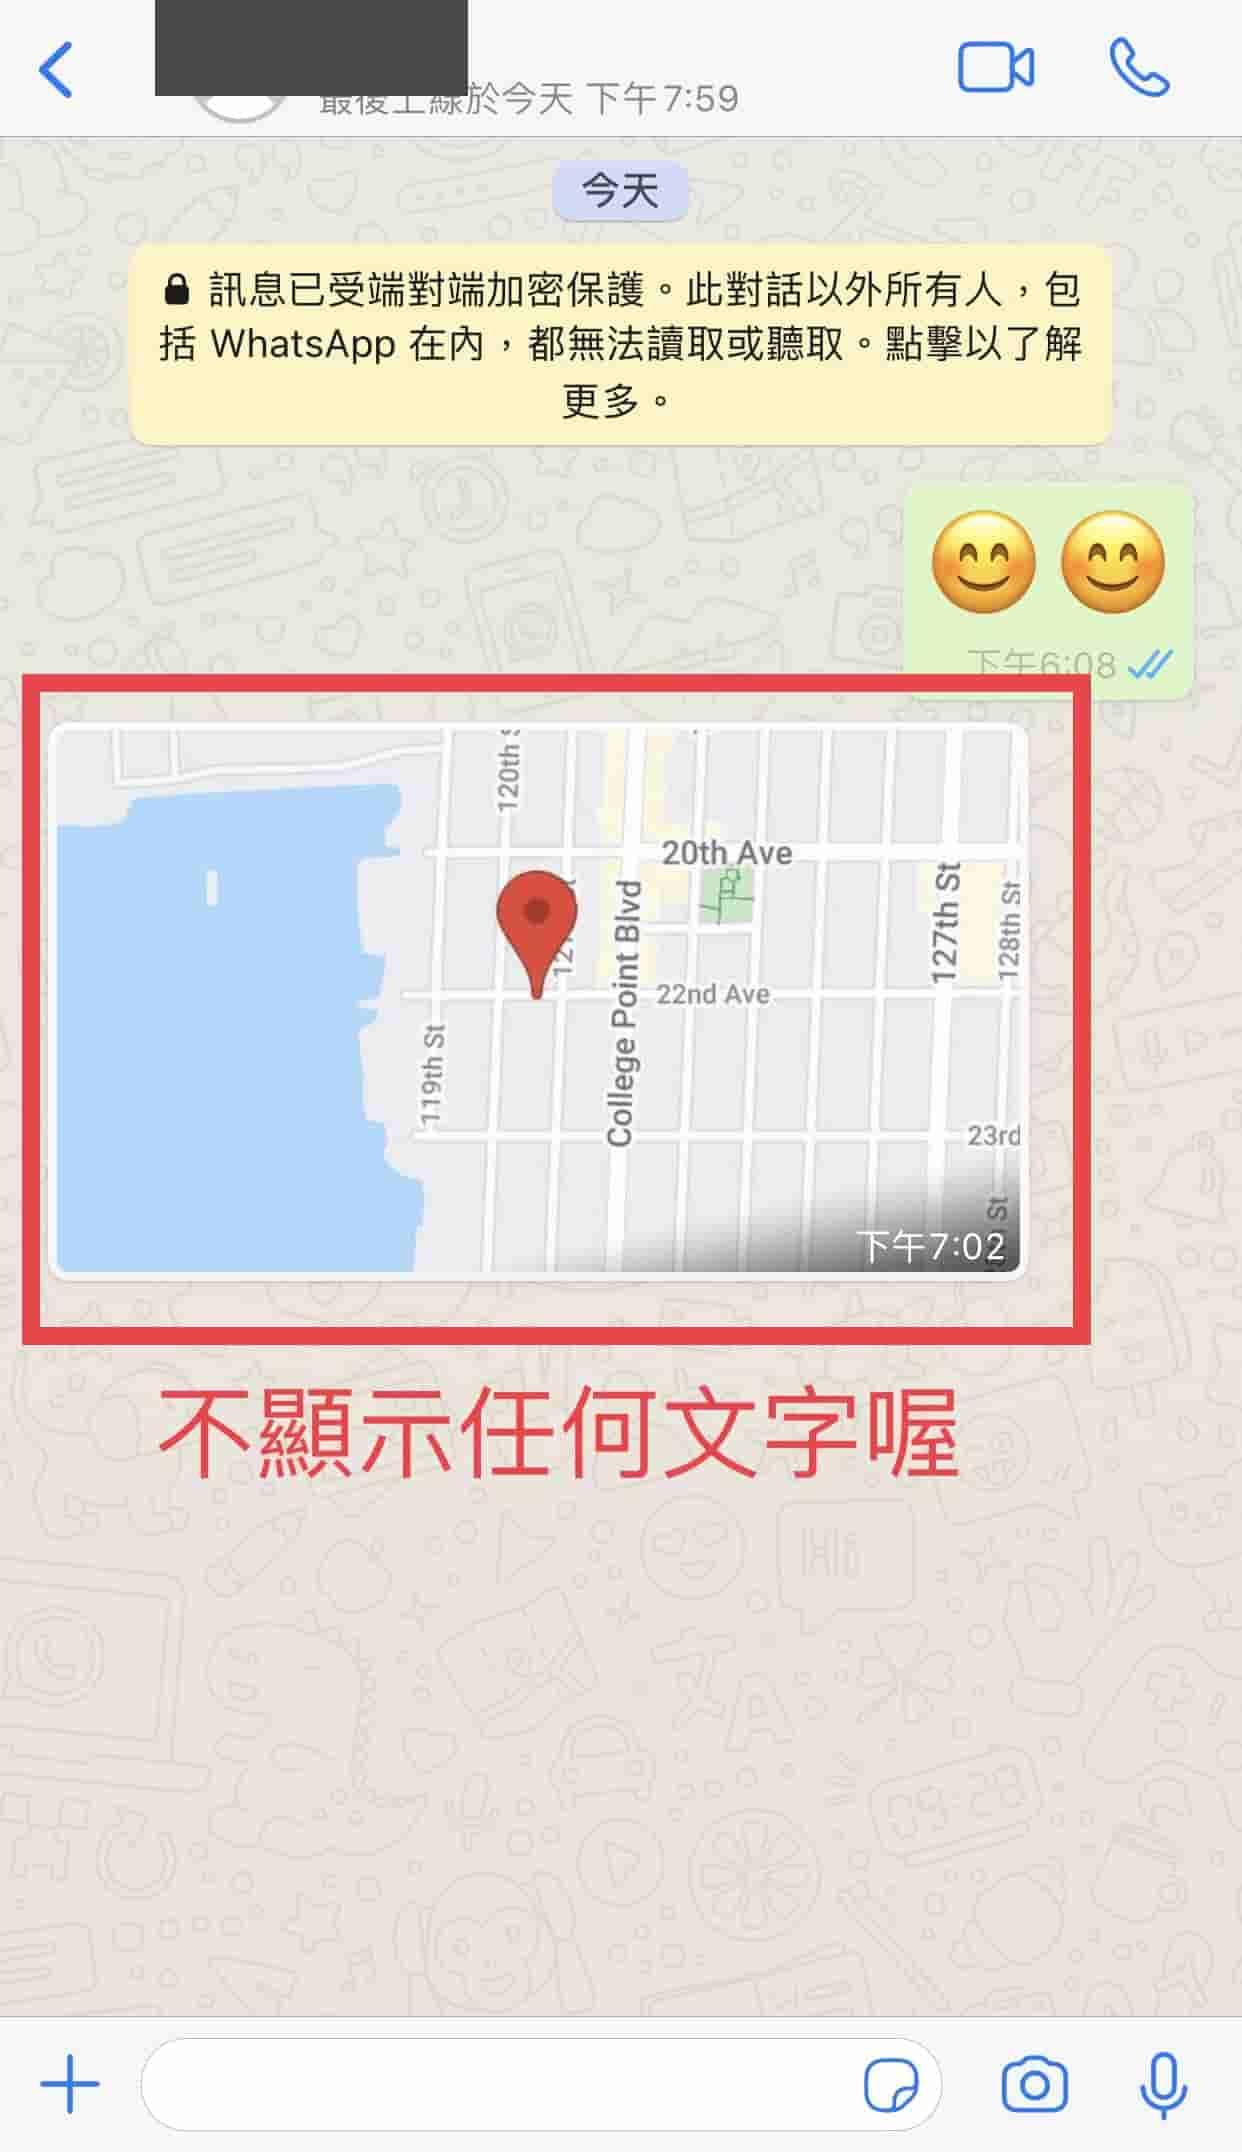 WhatsApp發送虛擬定位